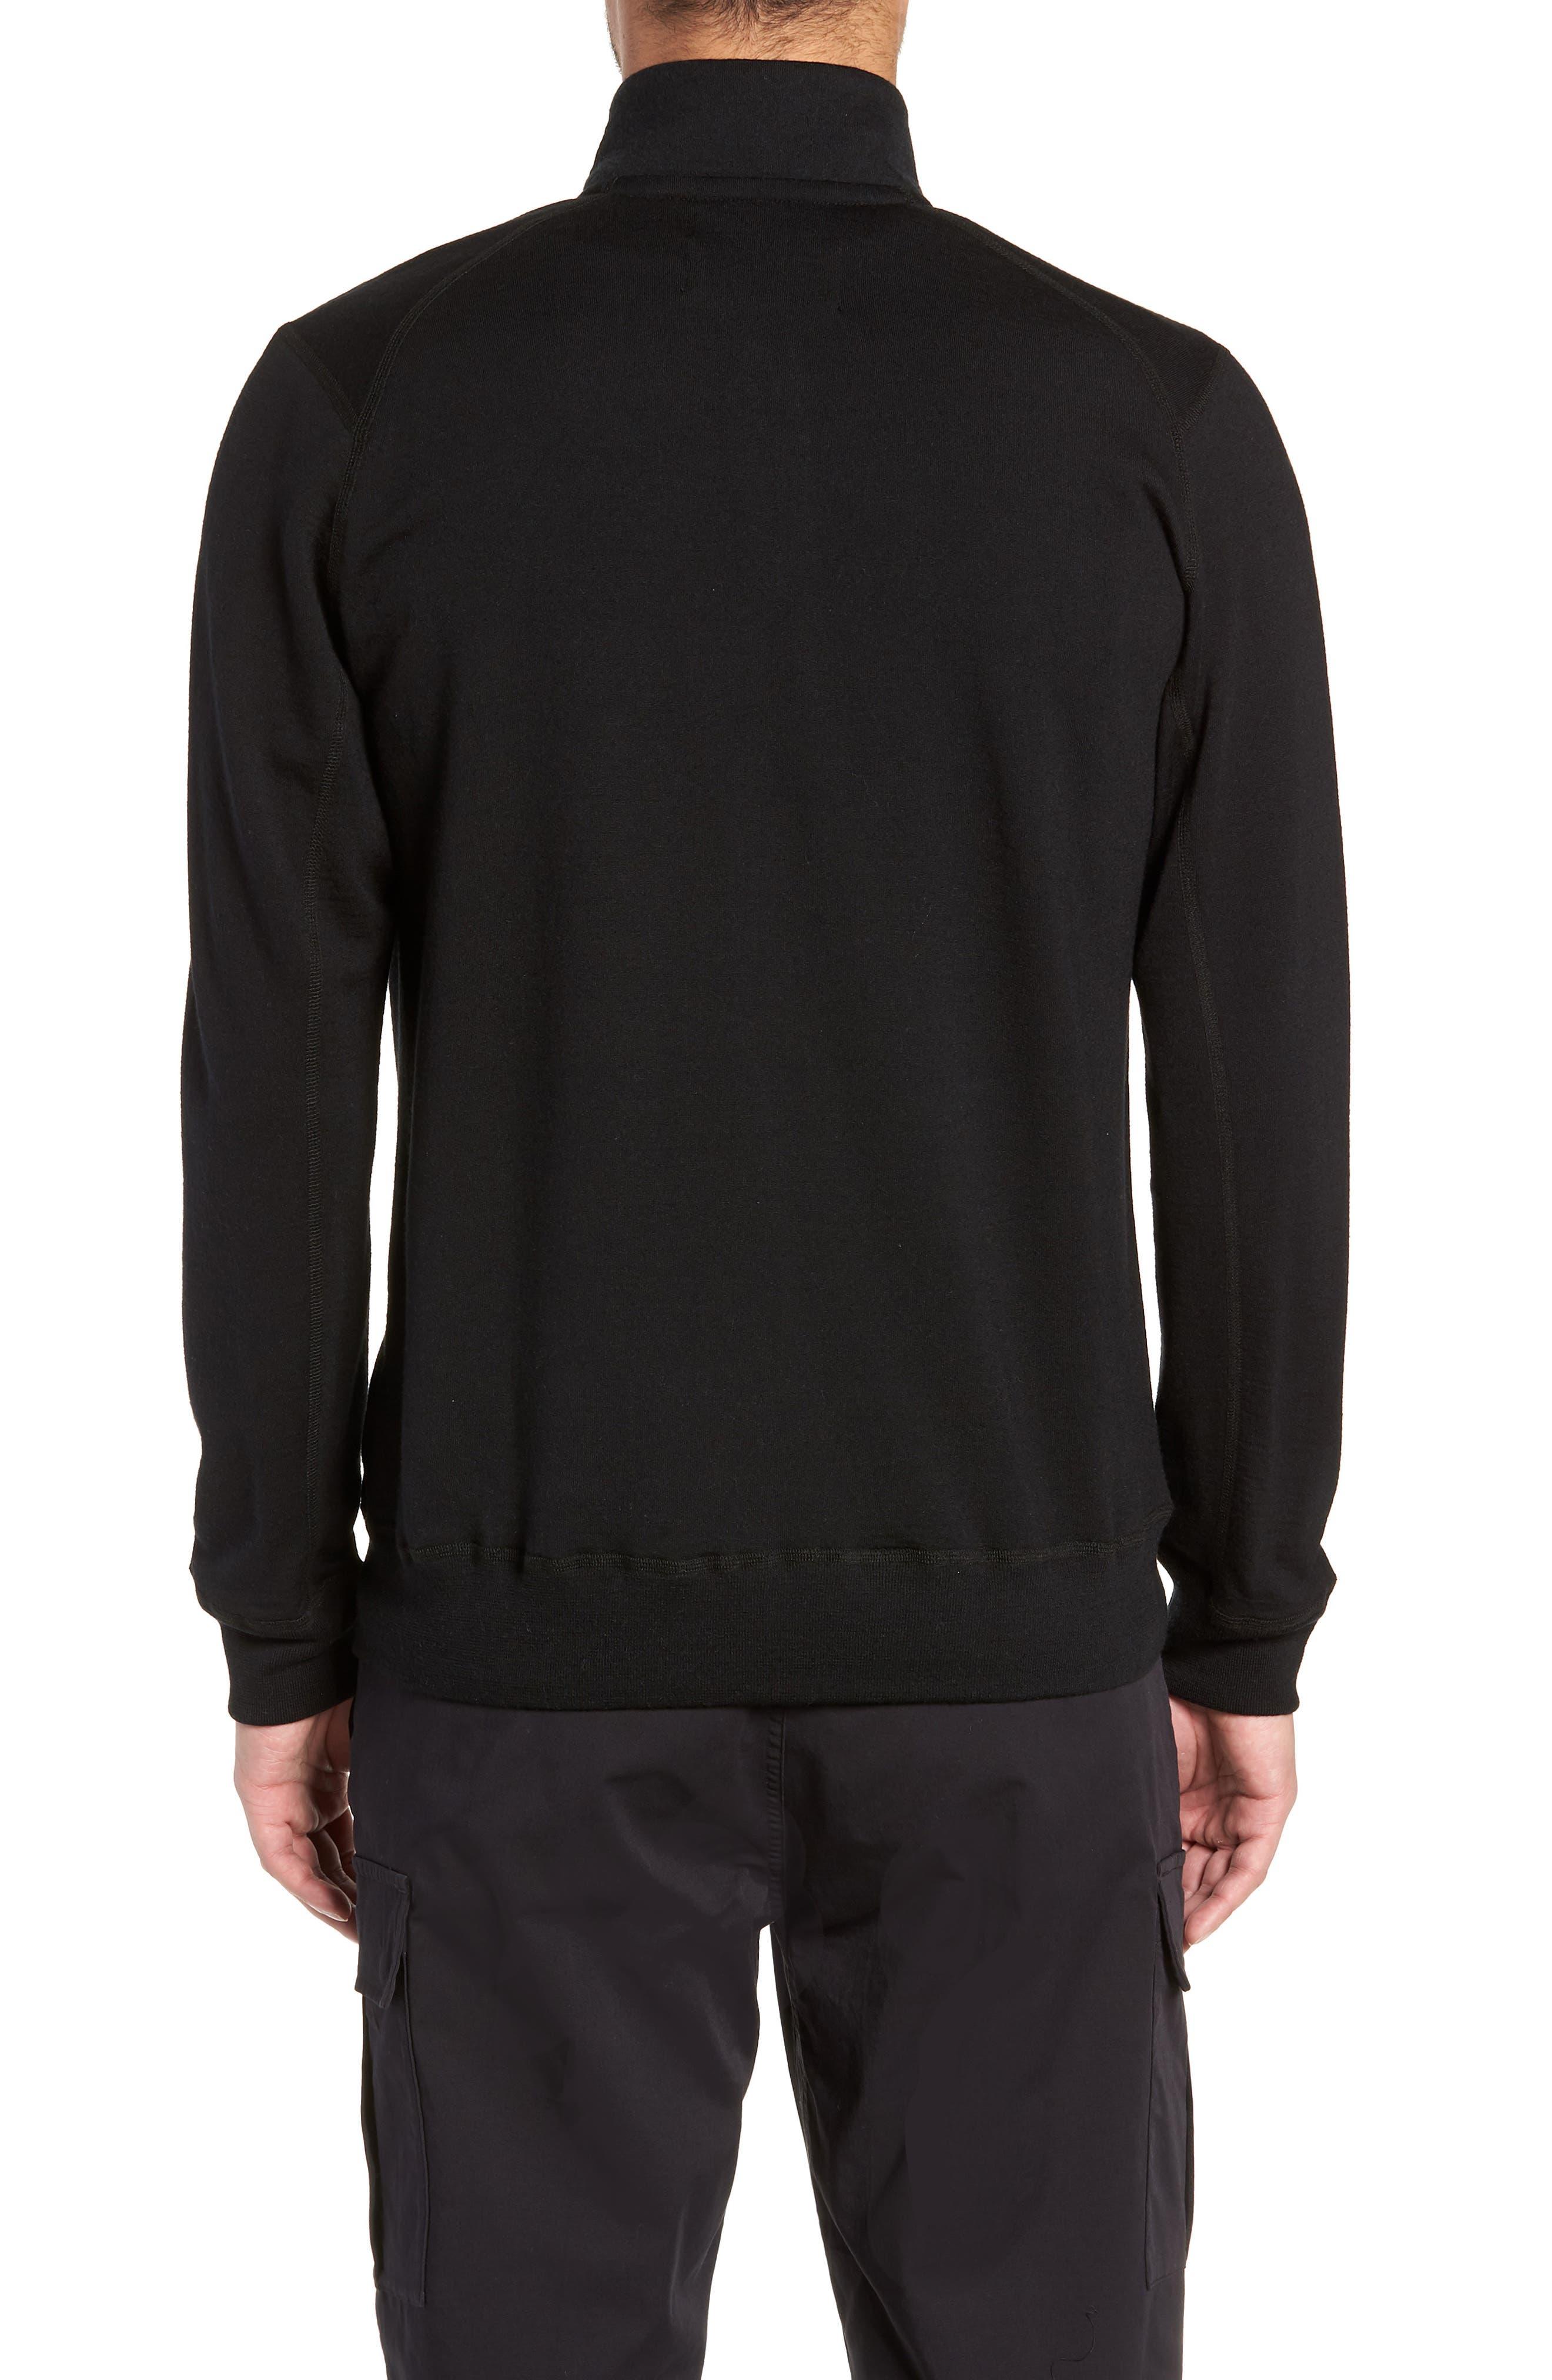 Swedish Merino Wool Trail Shirt,                             Alternate thumbnail 2, color,                             BLACK